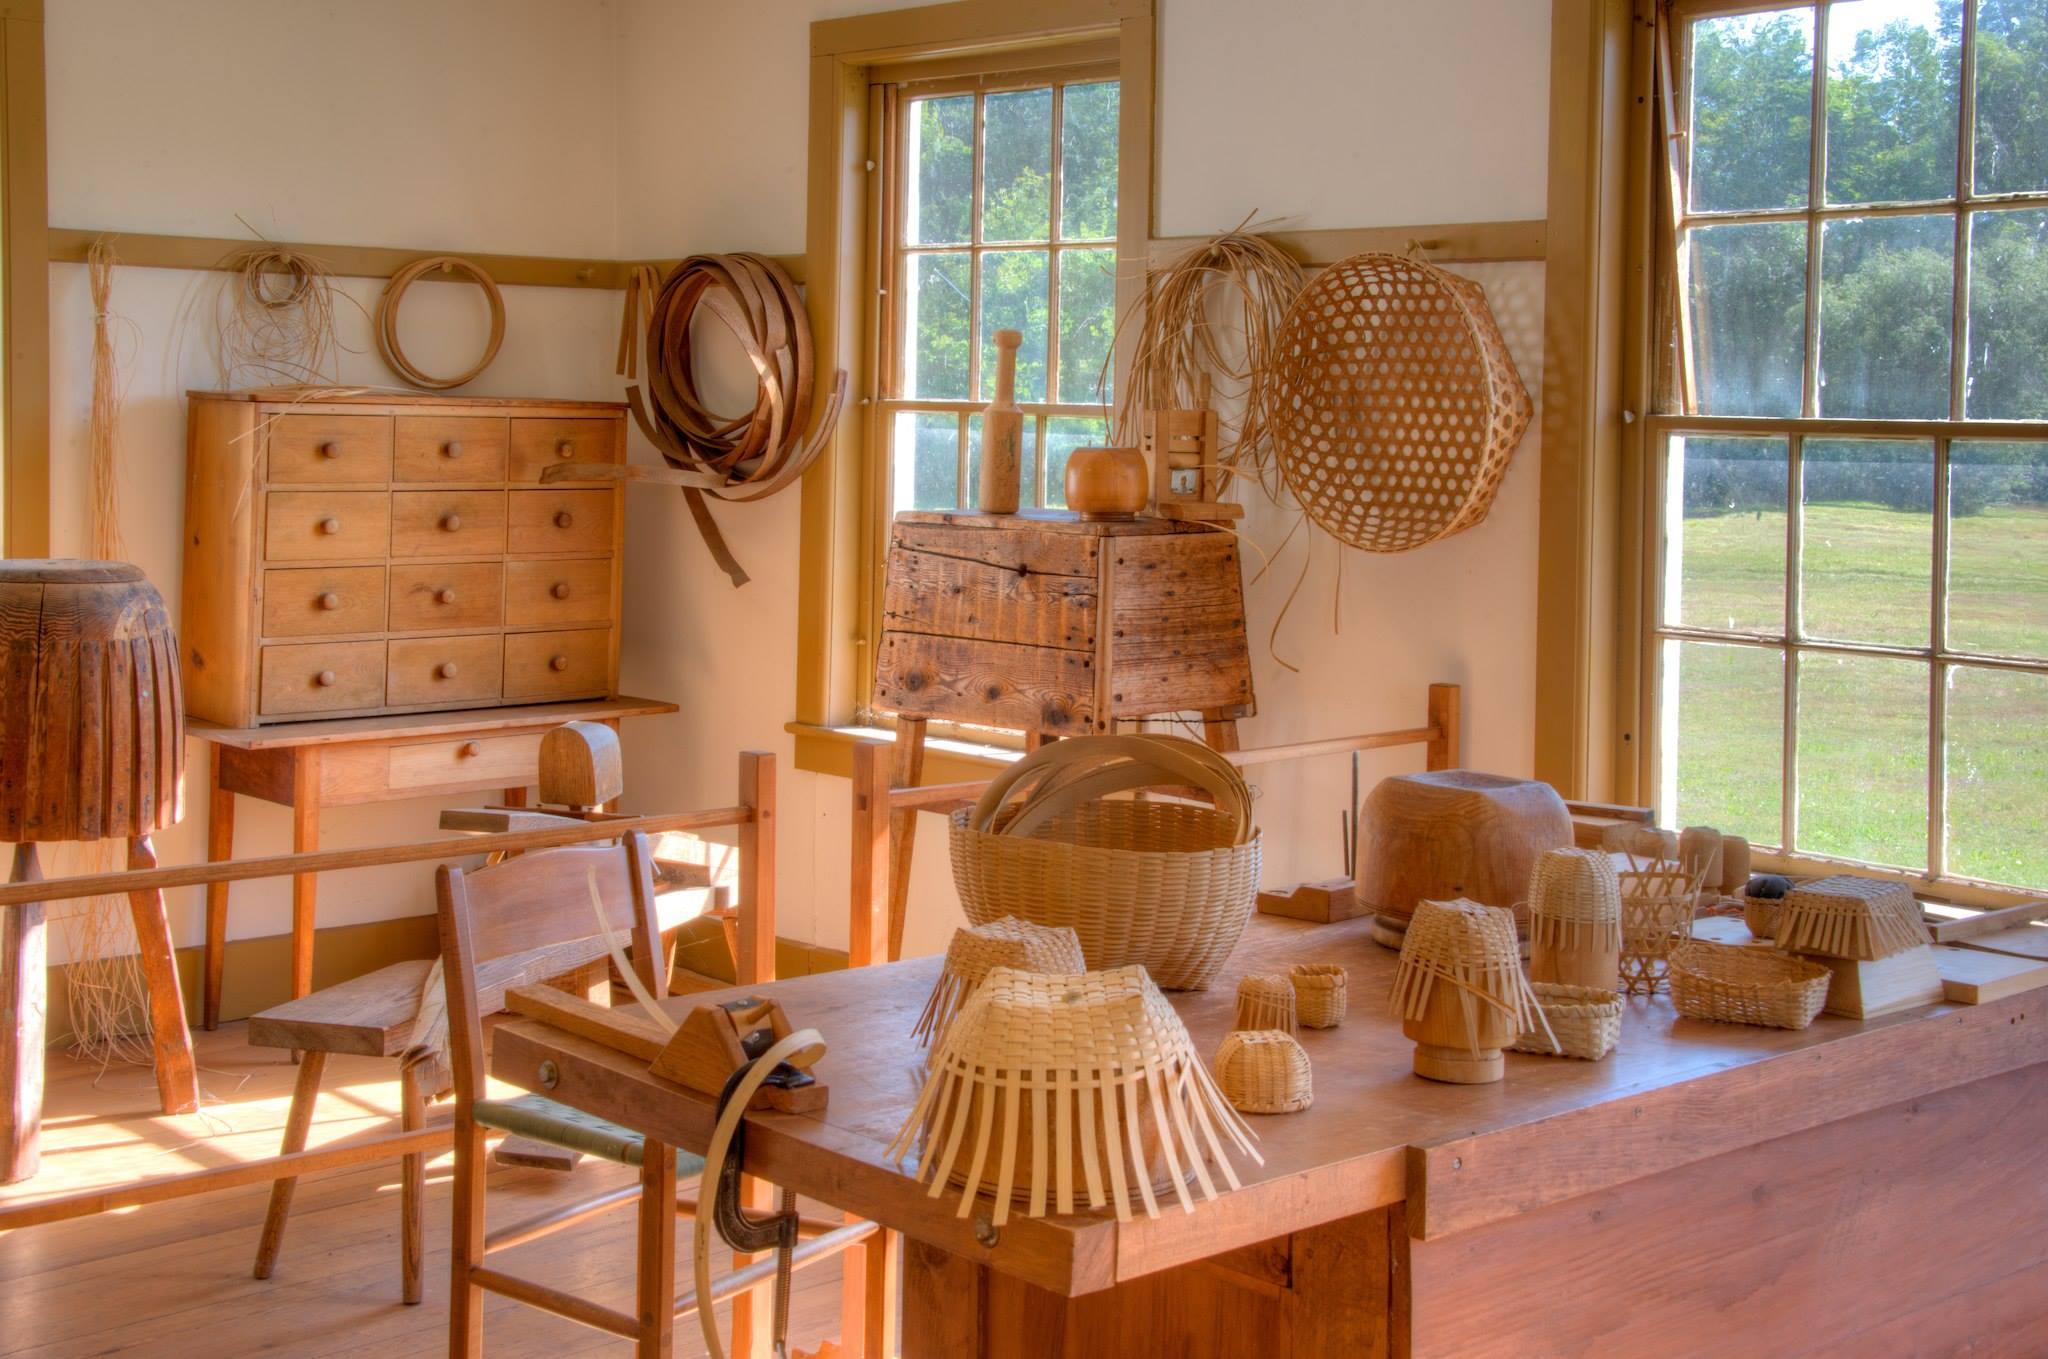 fileshaker basket manufacture ministry shop hancock shaker villagejpg